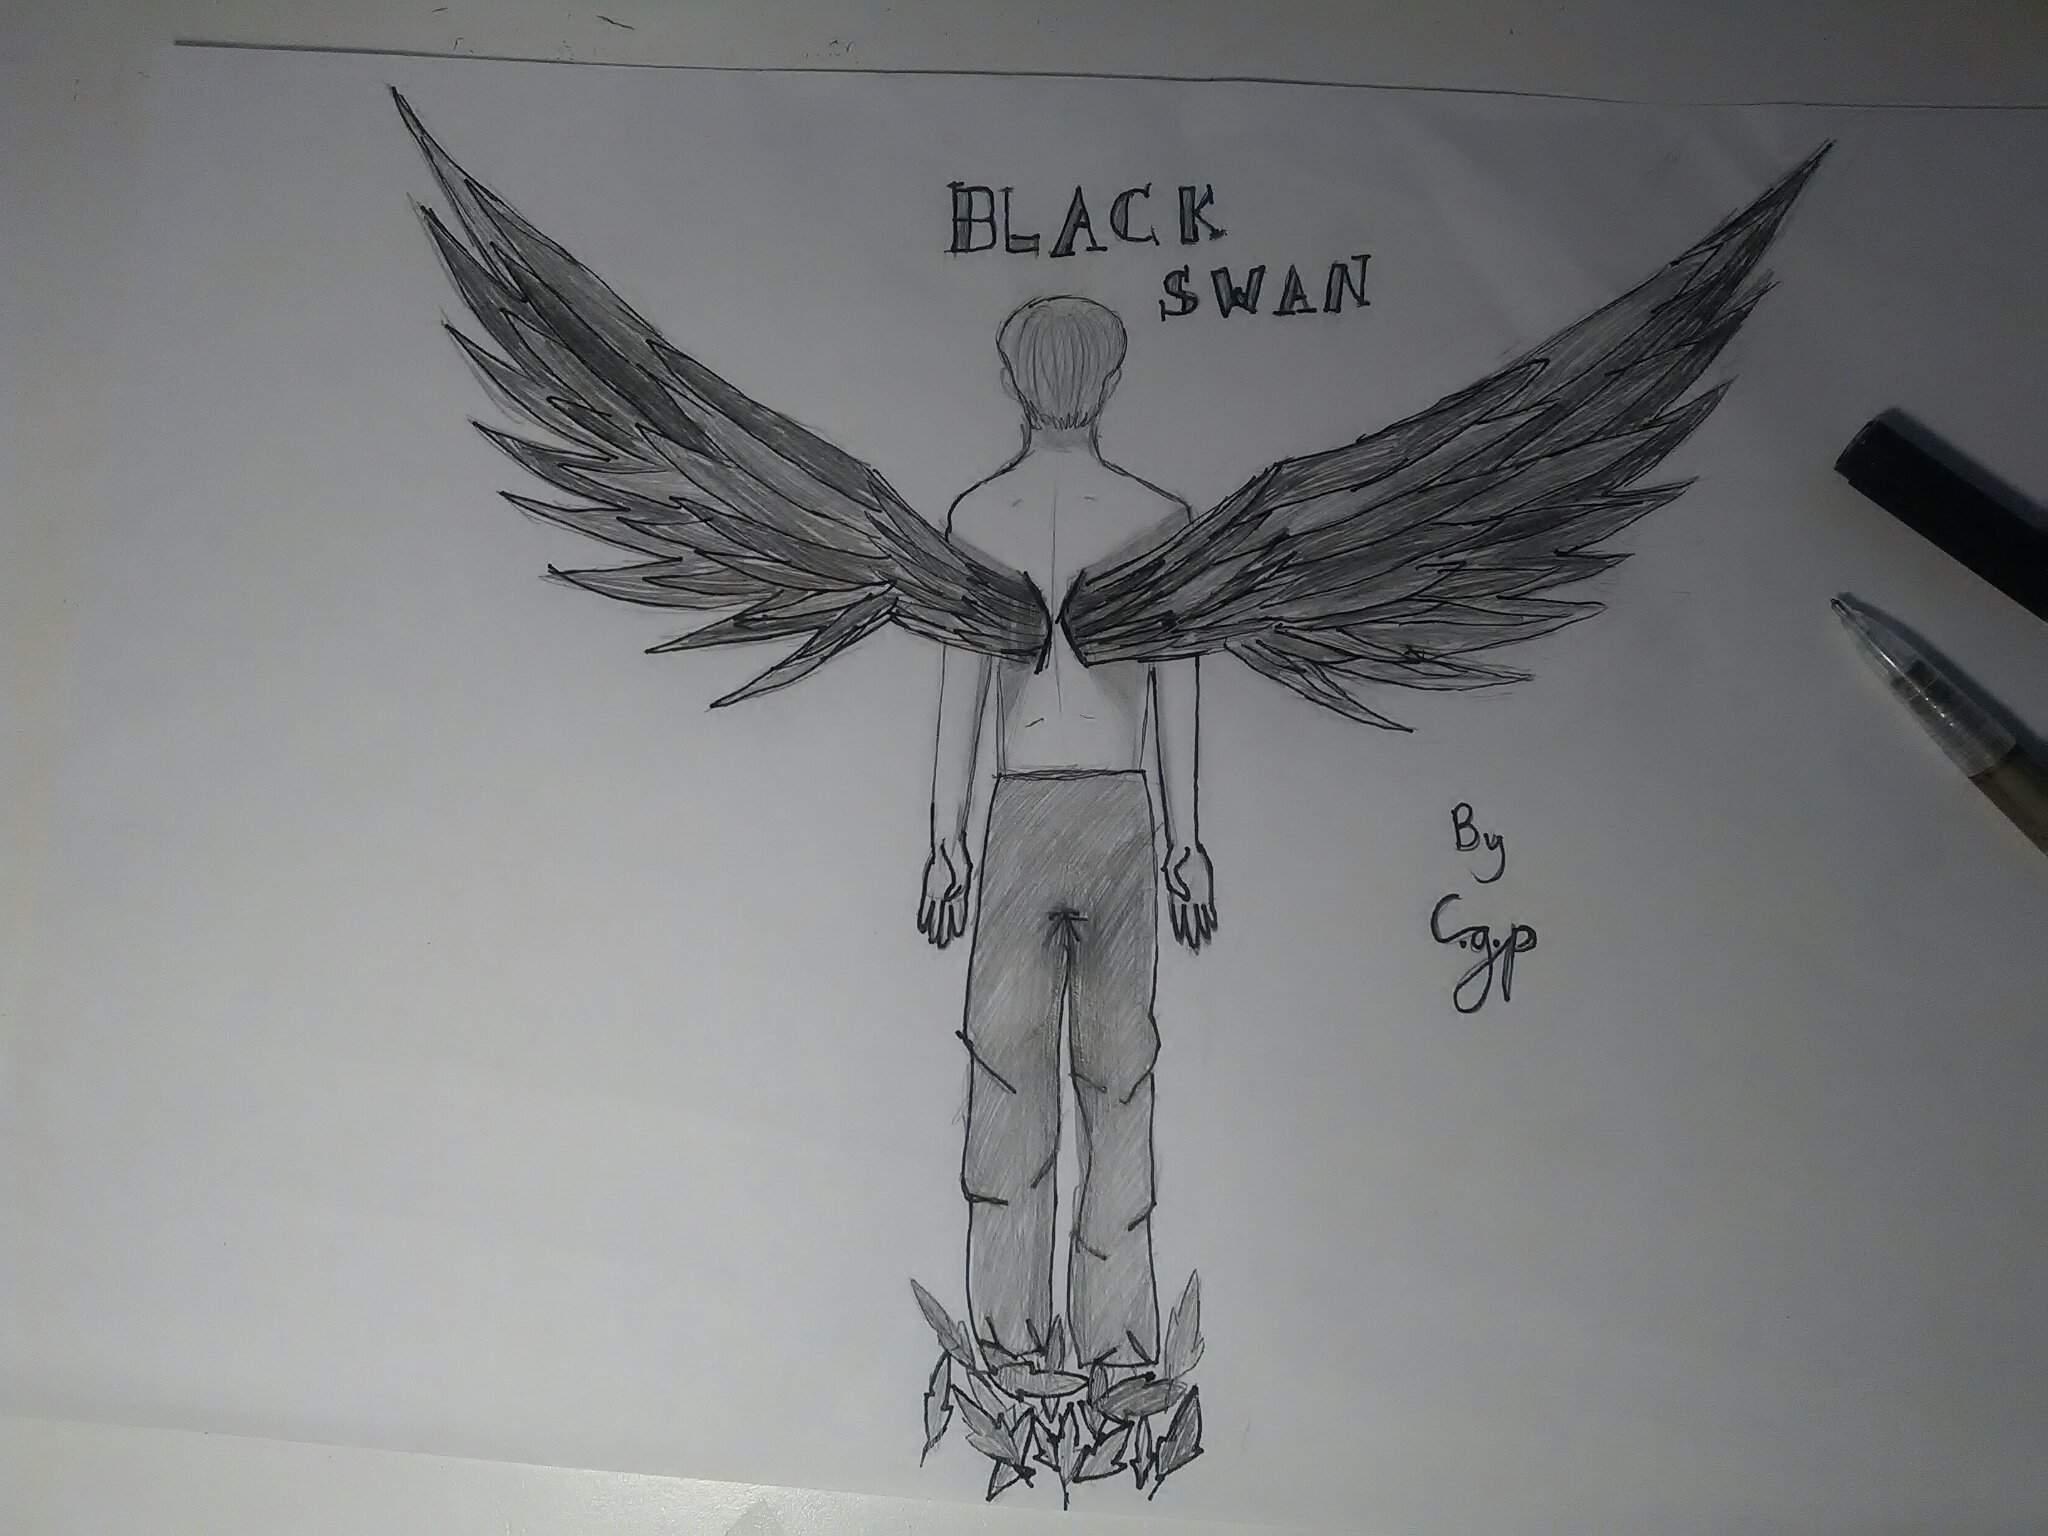 Bts Black Swan Wallpapers Top Free Bts Black Swan Backgrounds Wallpaperaccess